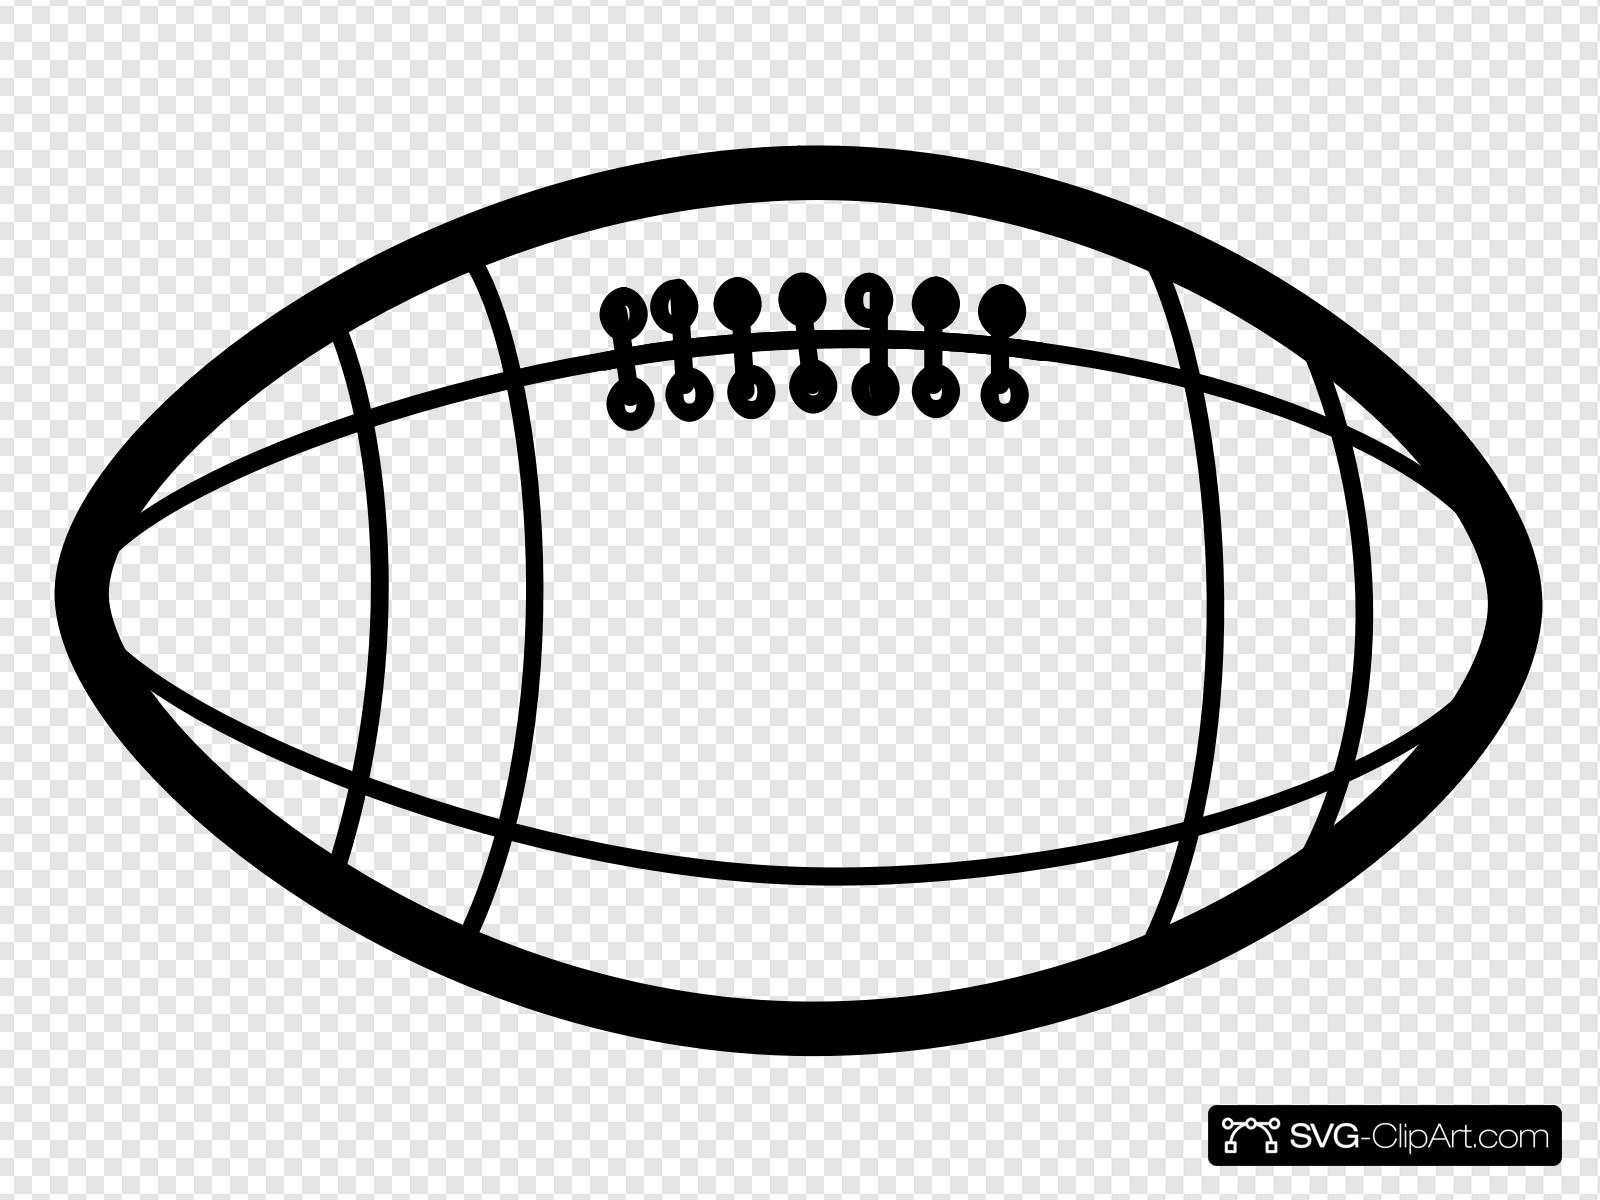 Football clipart book. Coloring clip art icon